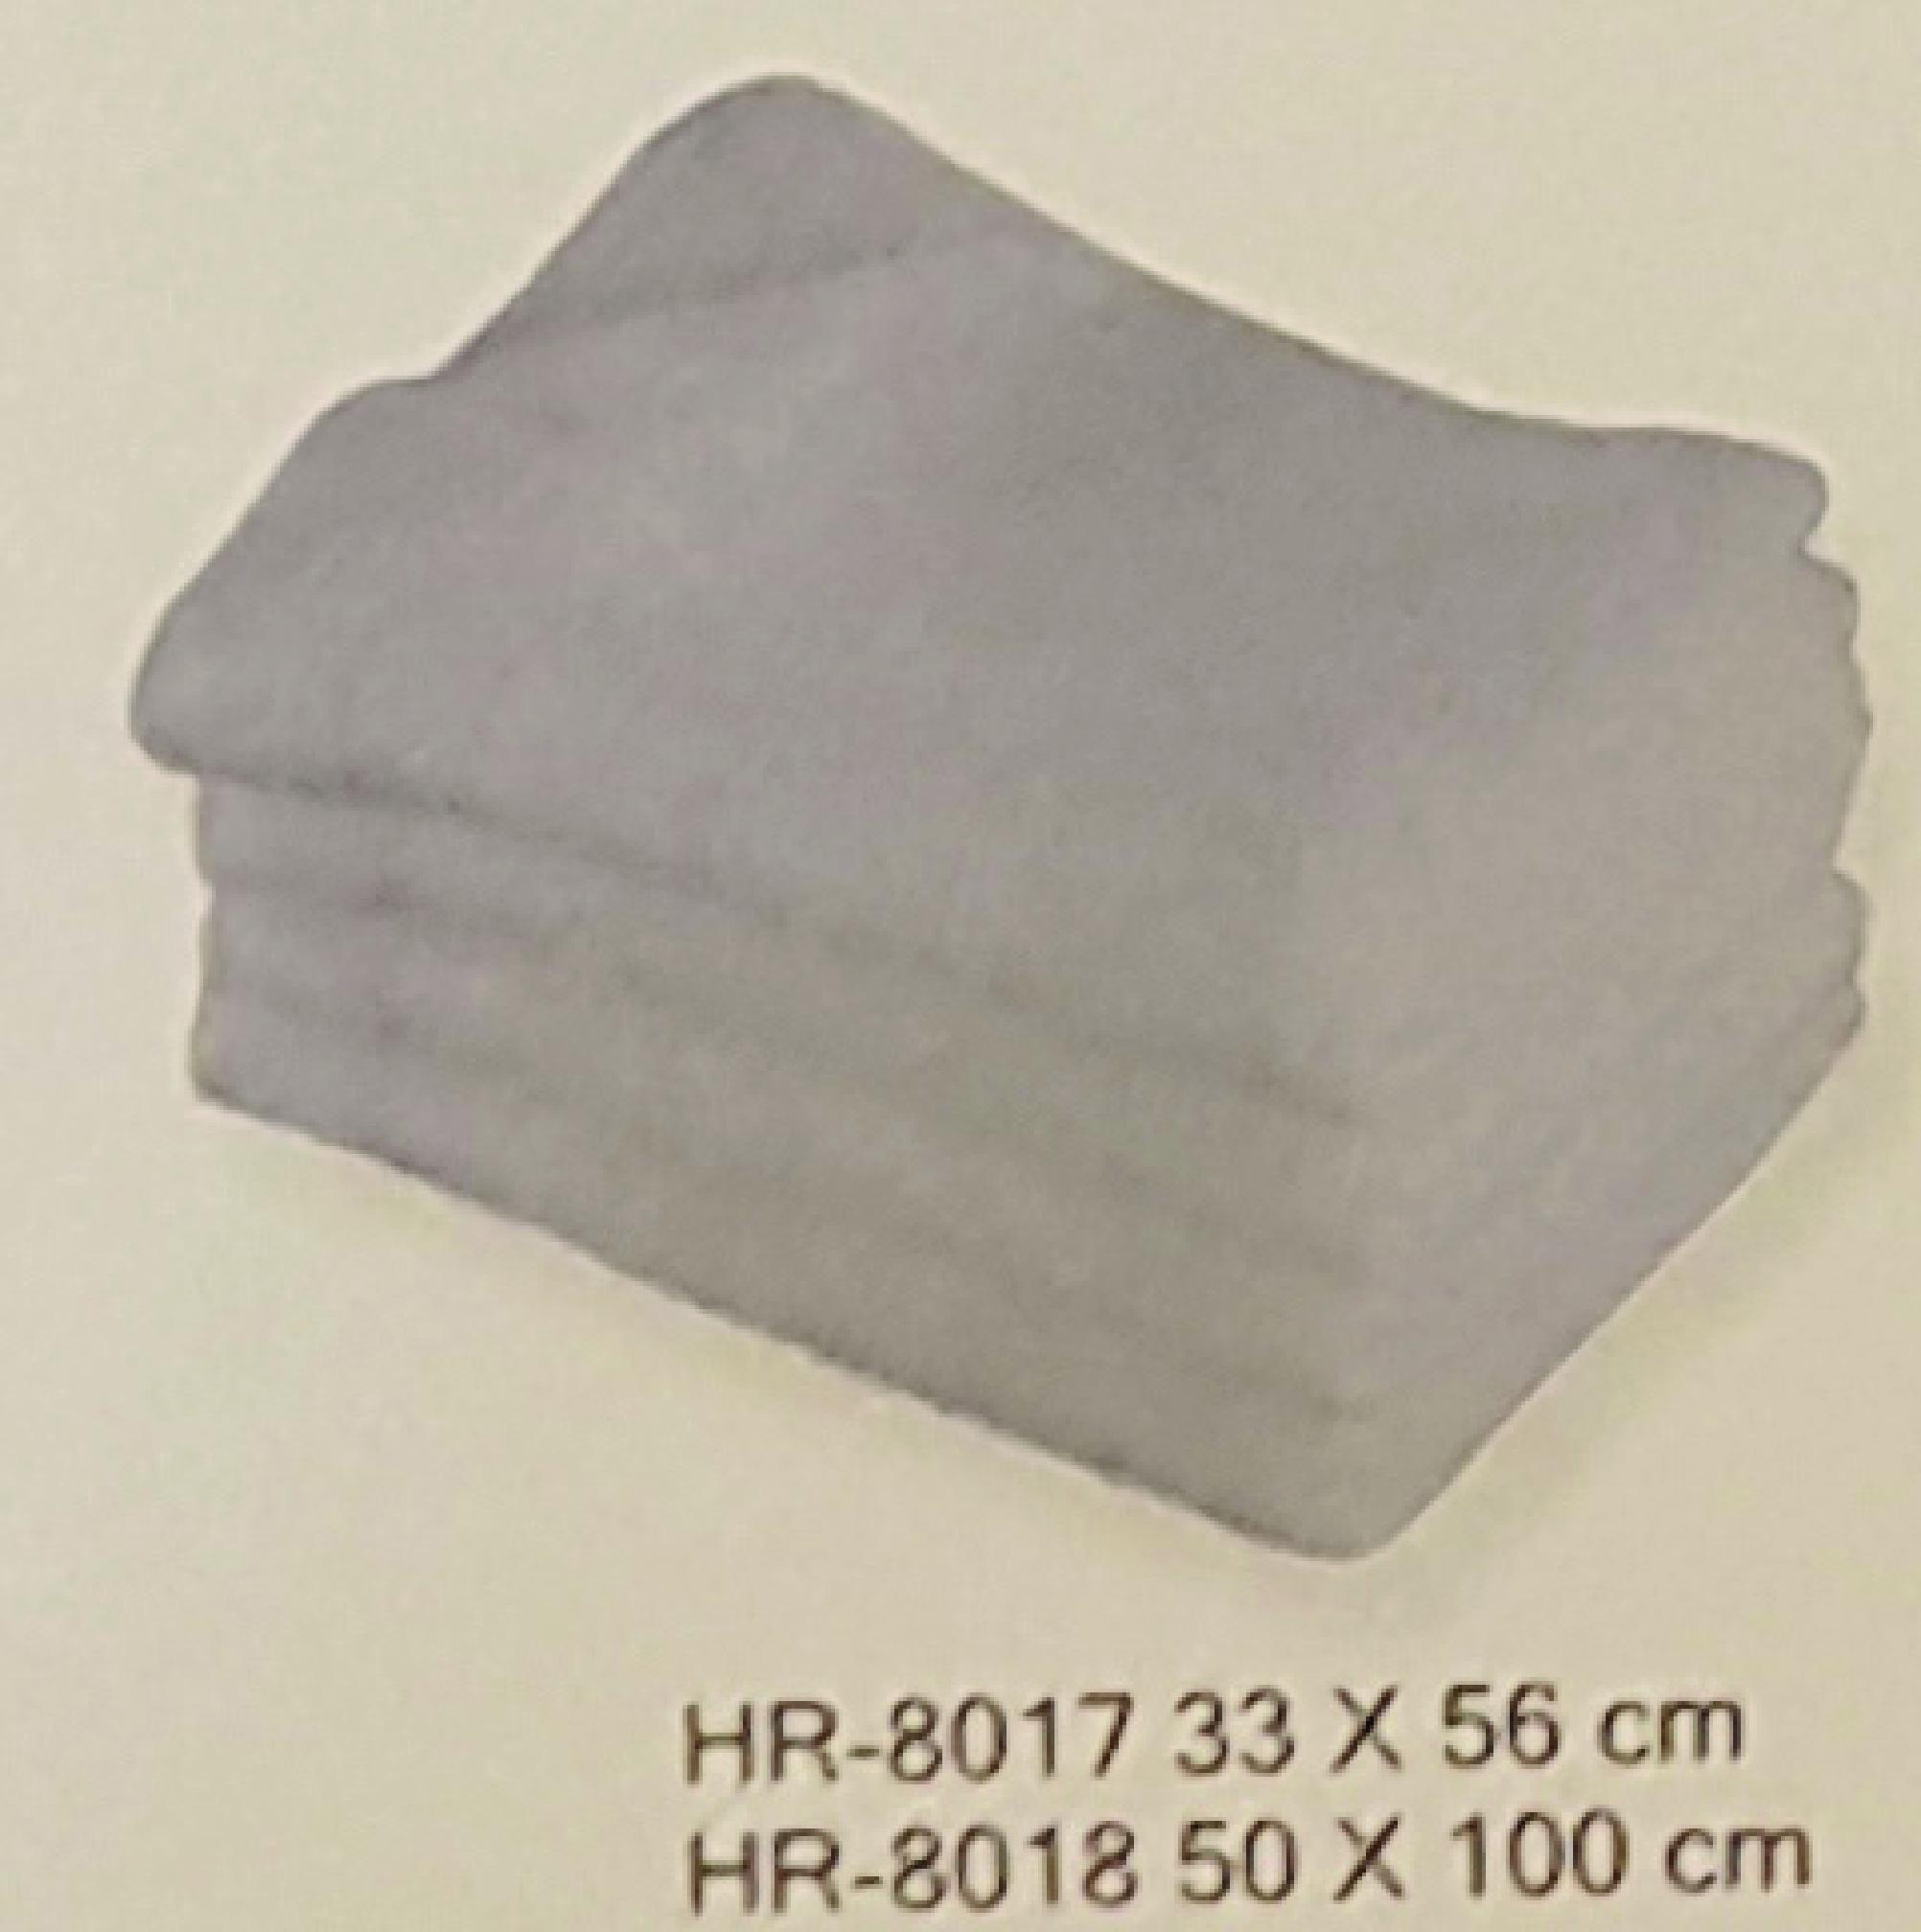 HR-8017 - 18